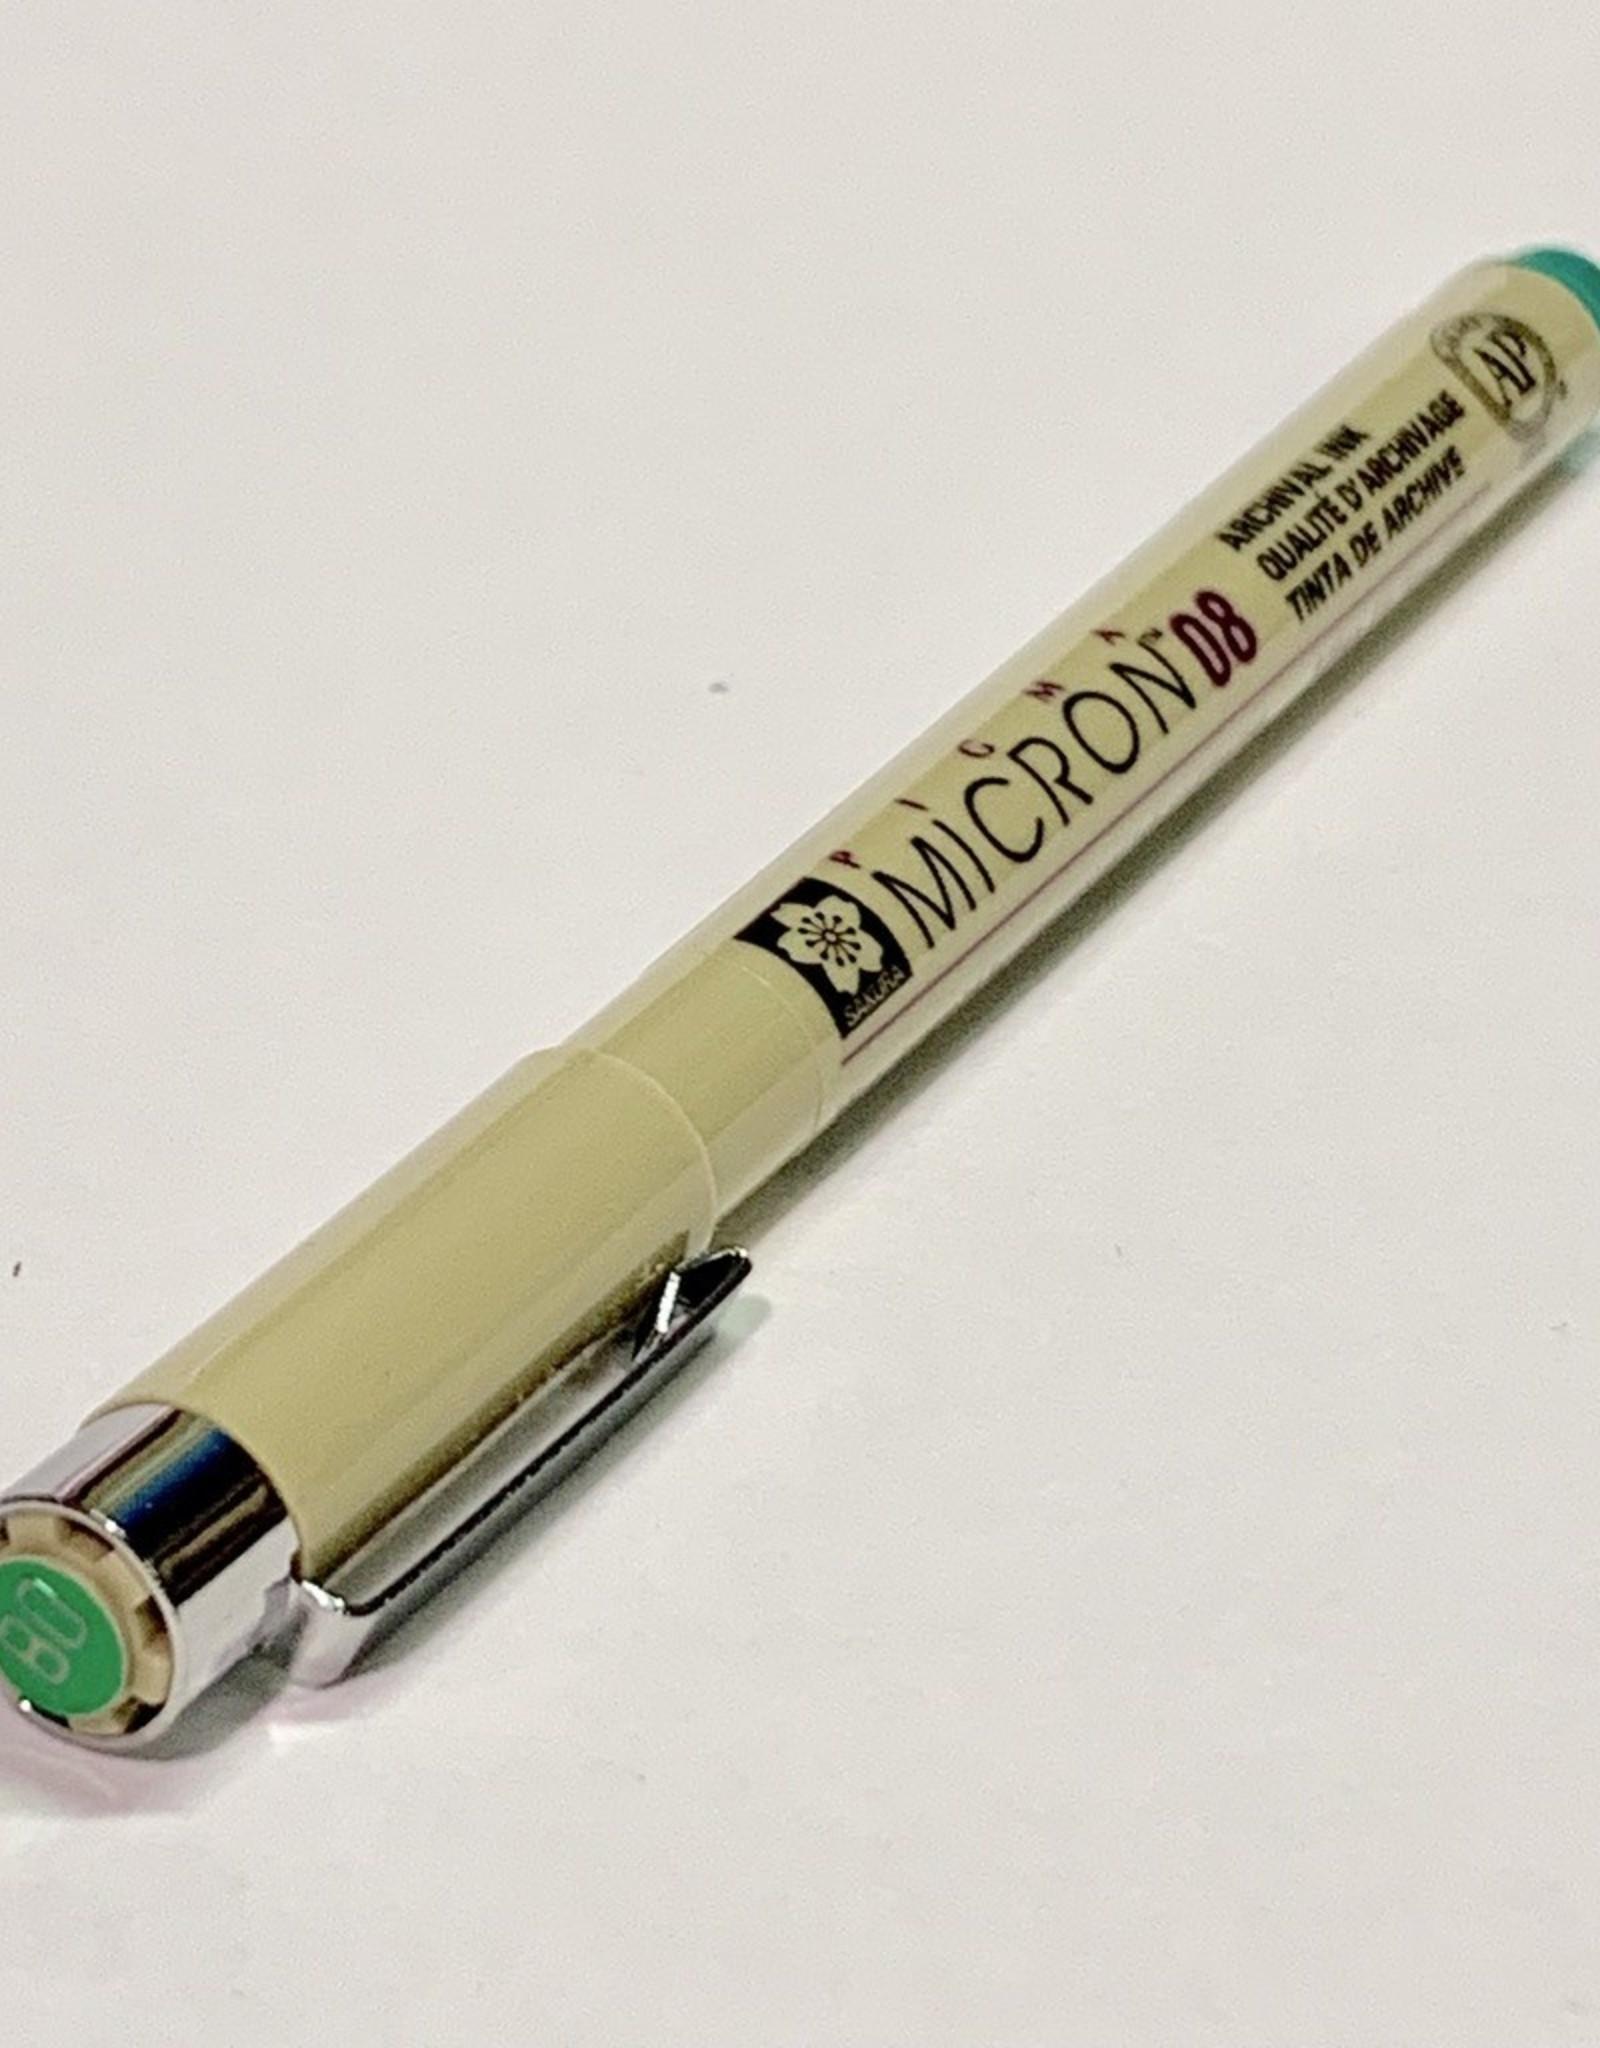 Sakura Micron Green Pen 08 .50mm